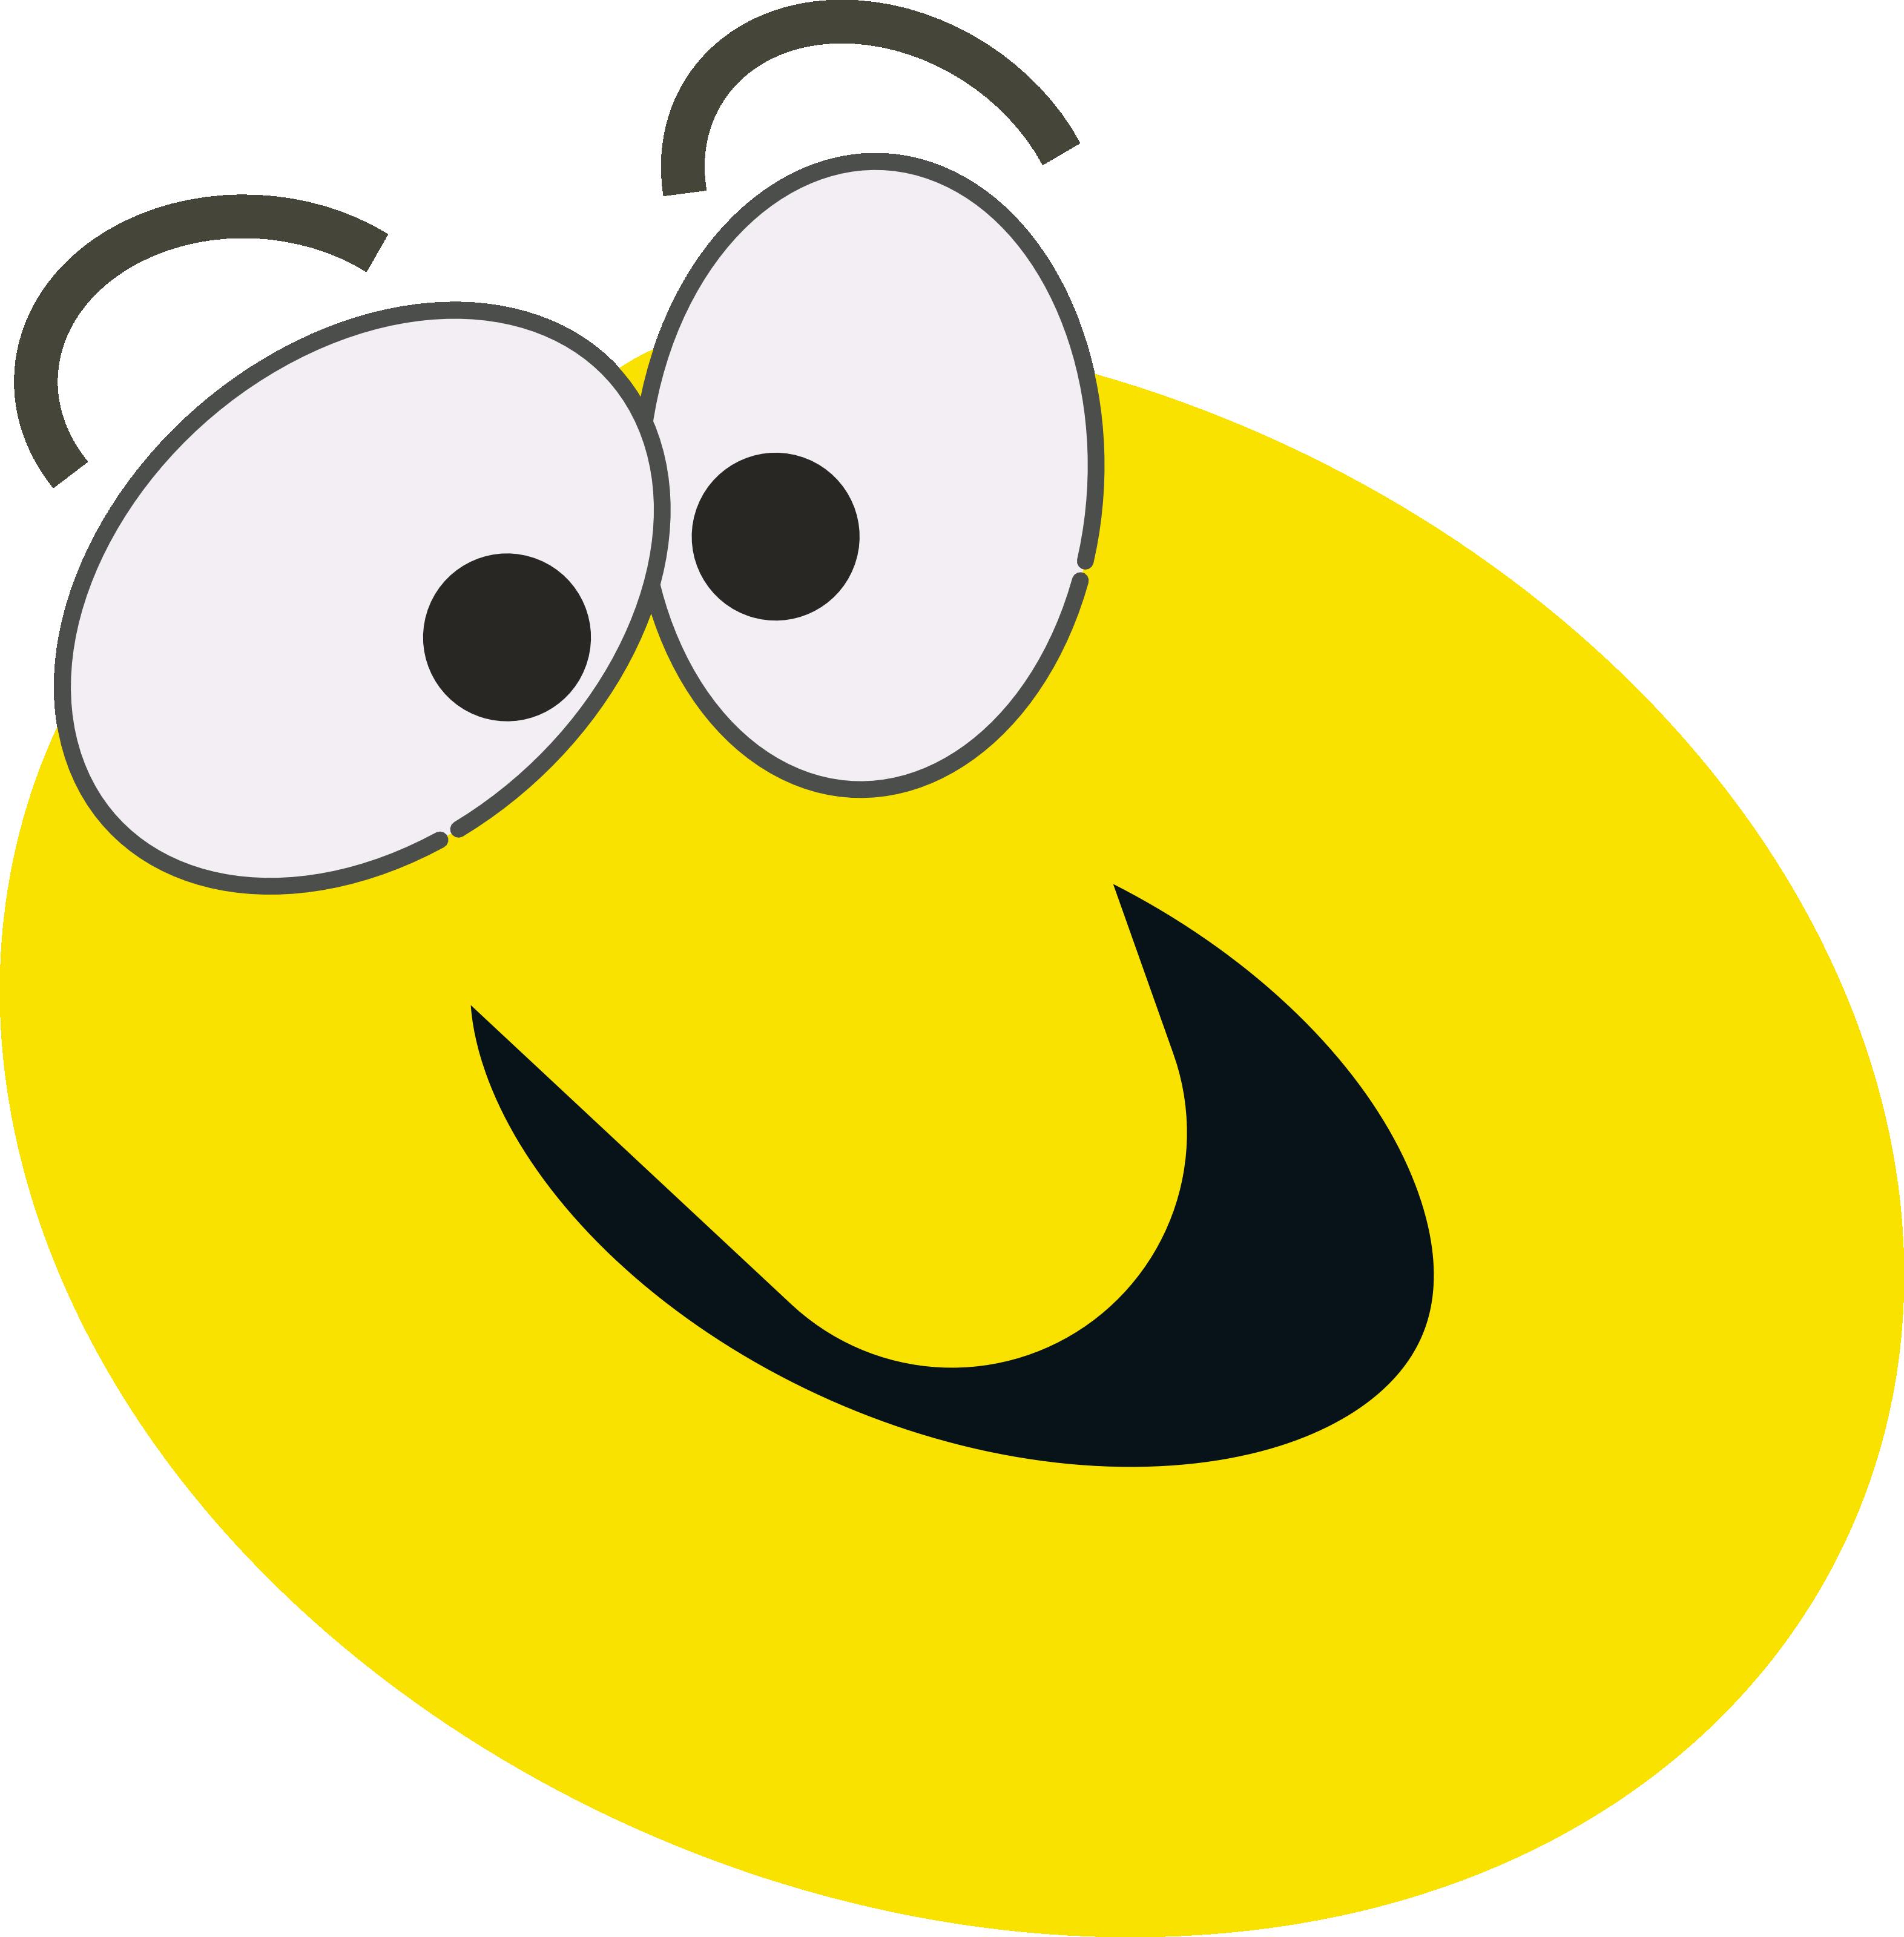 Smiley Face Happy Face Clip Art Free 3 C-Smiley face happy face clip art free 3 clipartcow-17